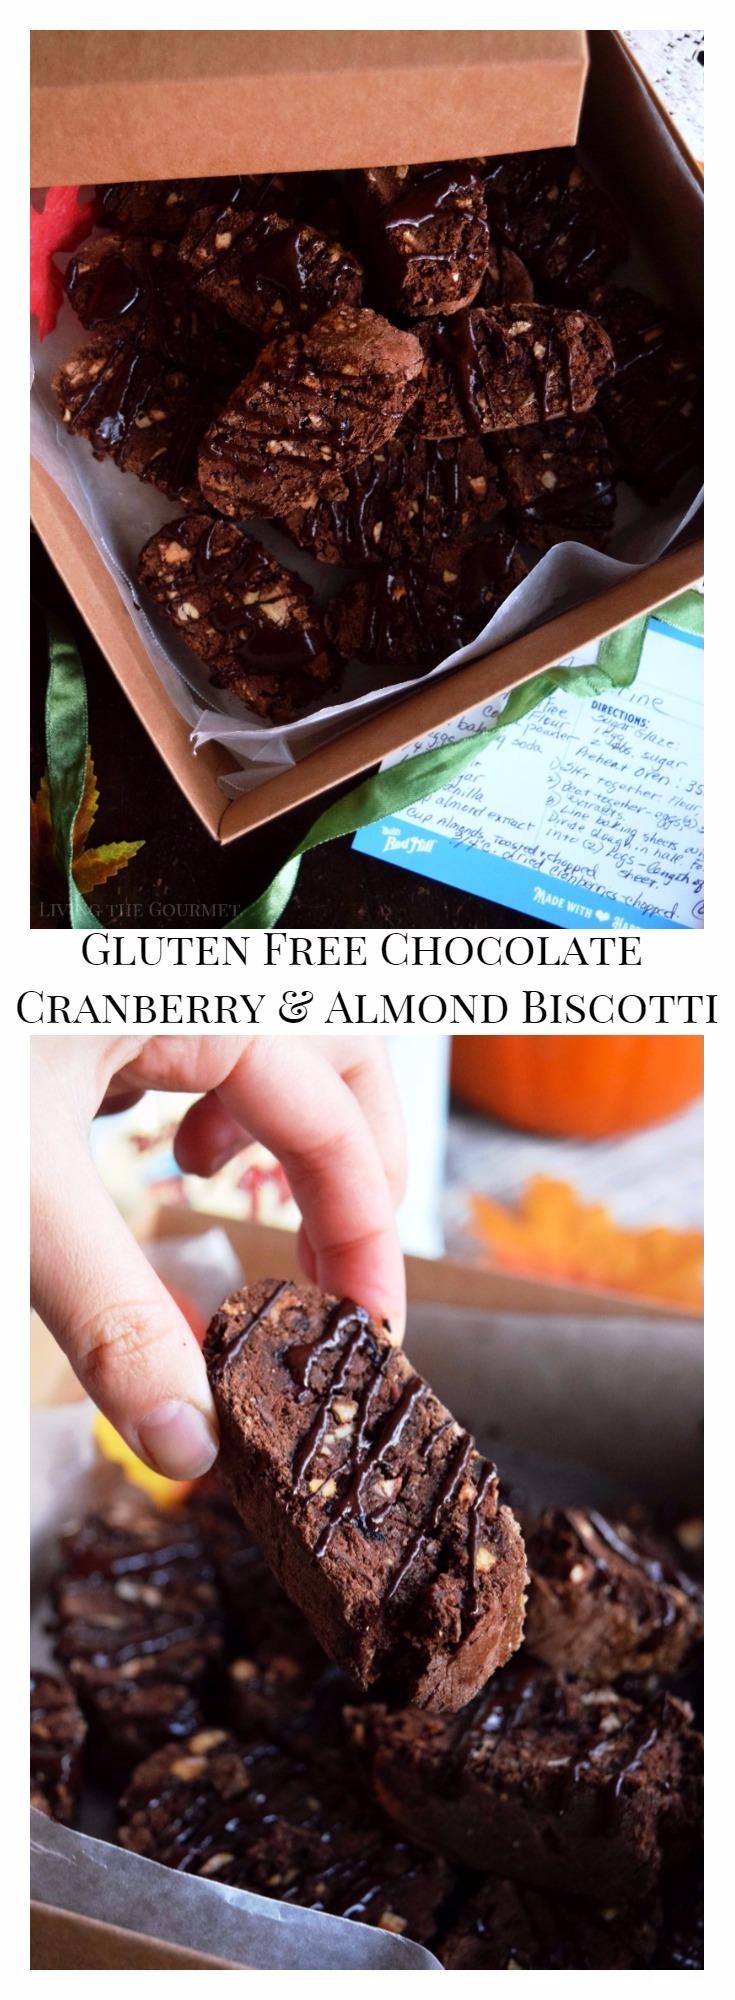 Gluten Free Chocolate Cranberry and Almond Biscotti ...